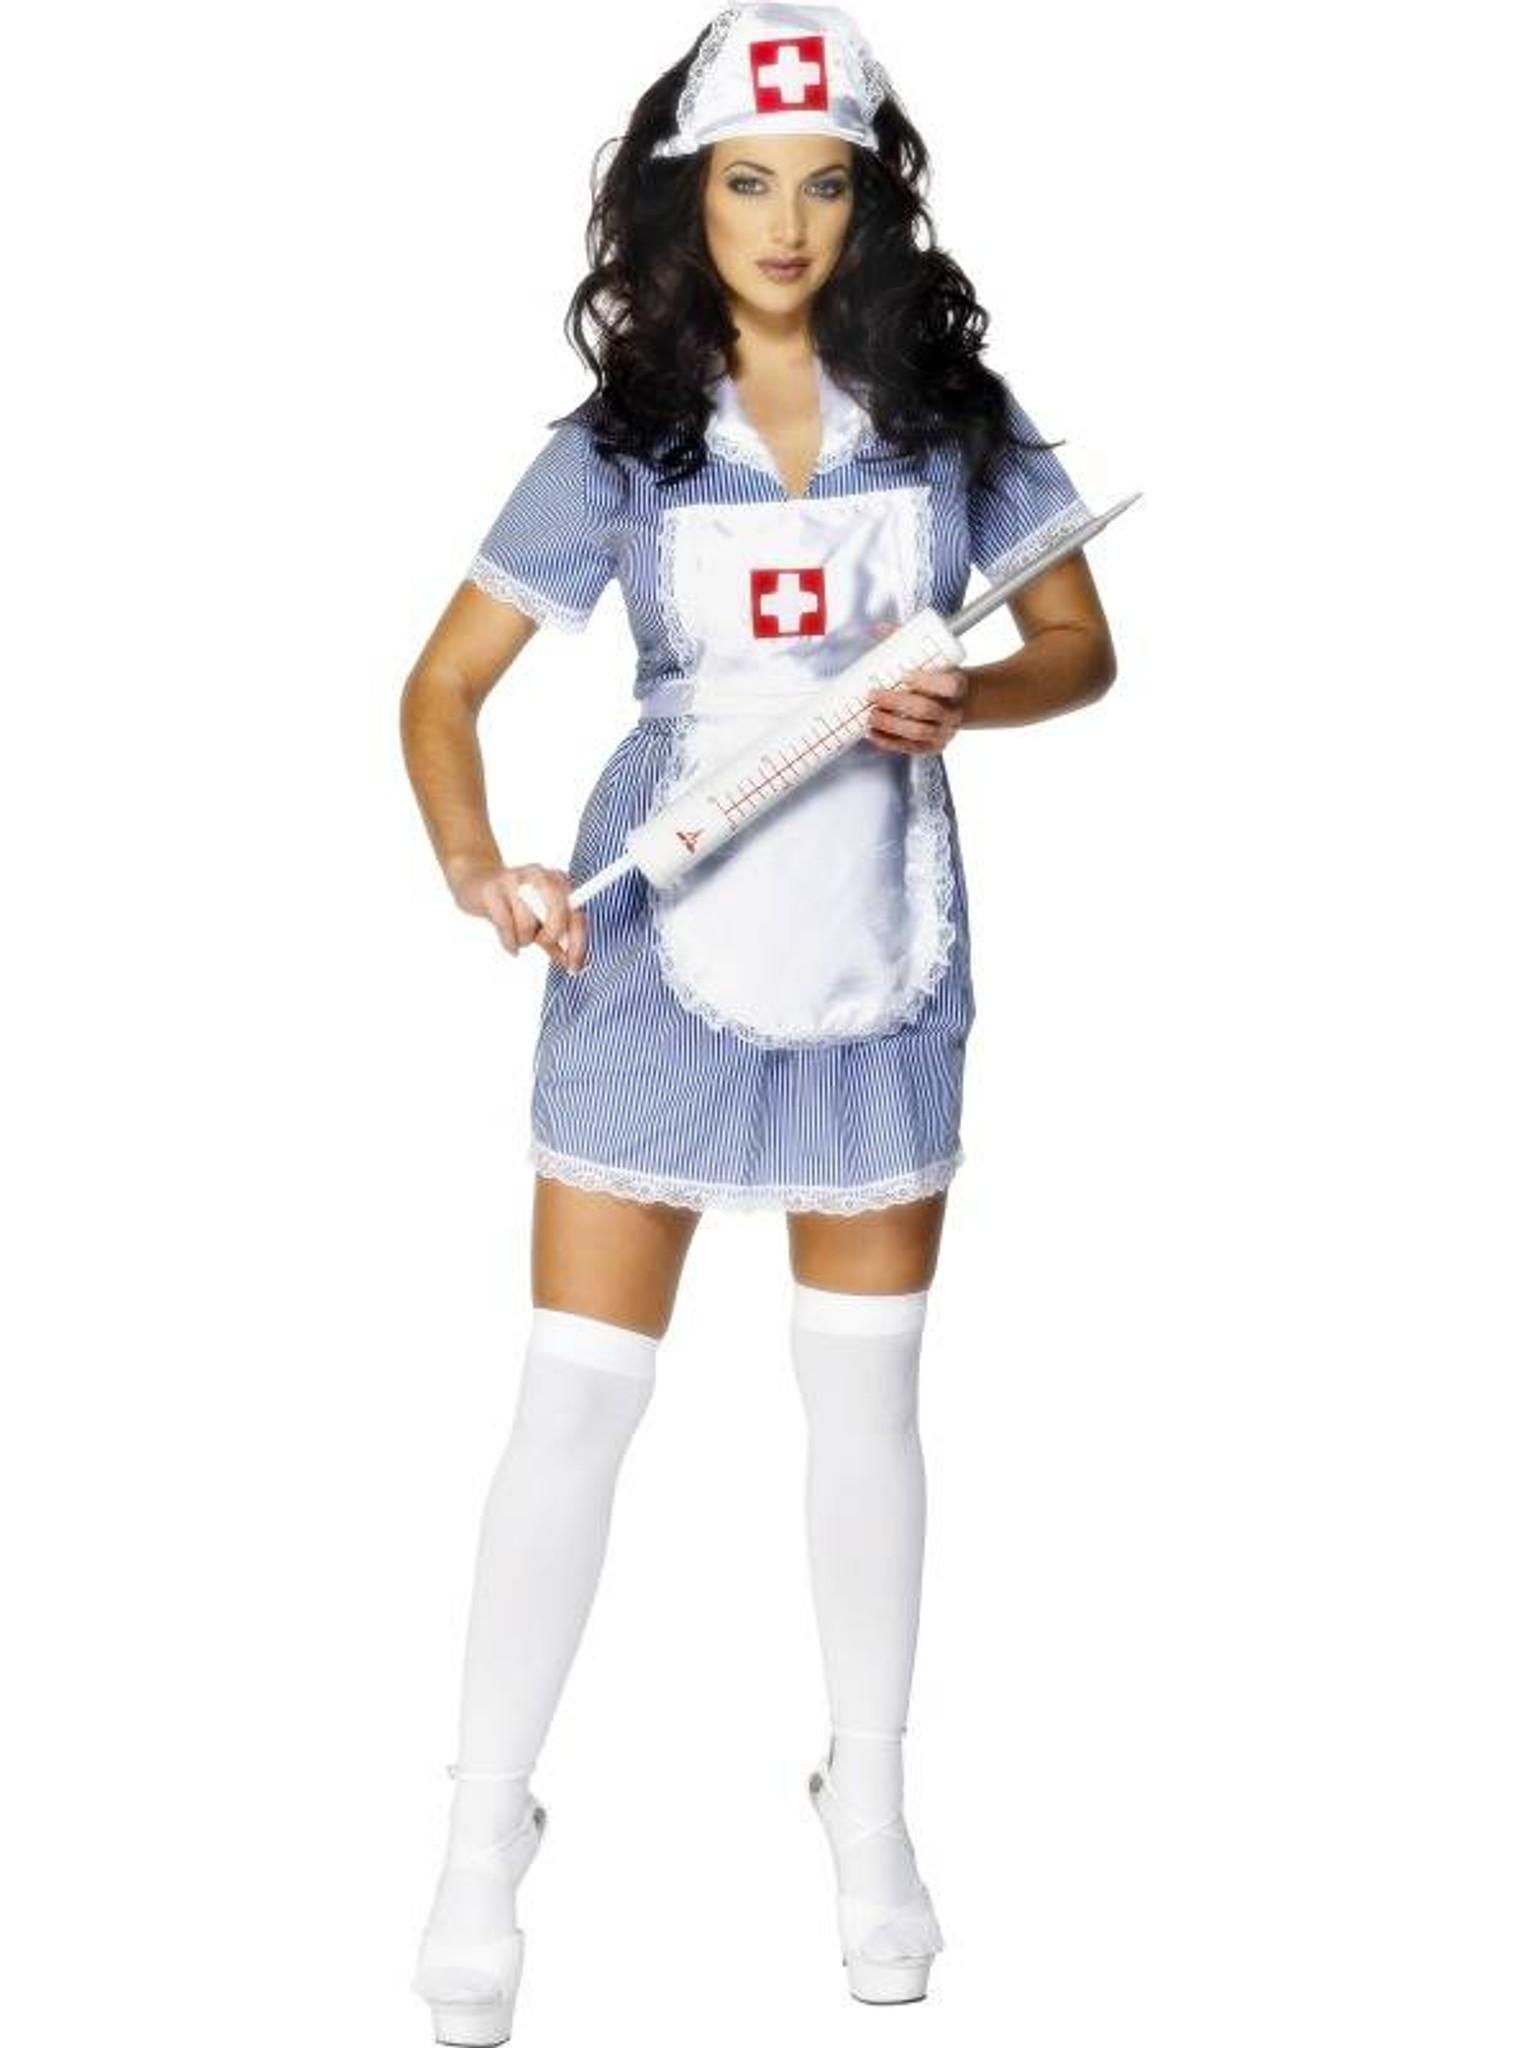 Nurse Naughty Costume, UK 12,14